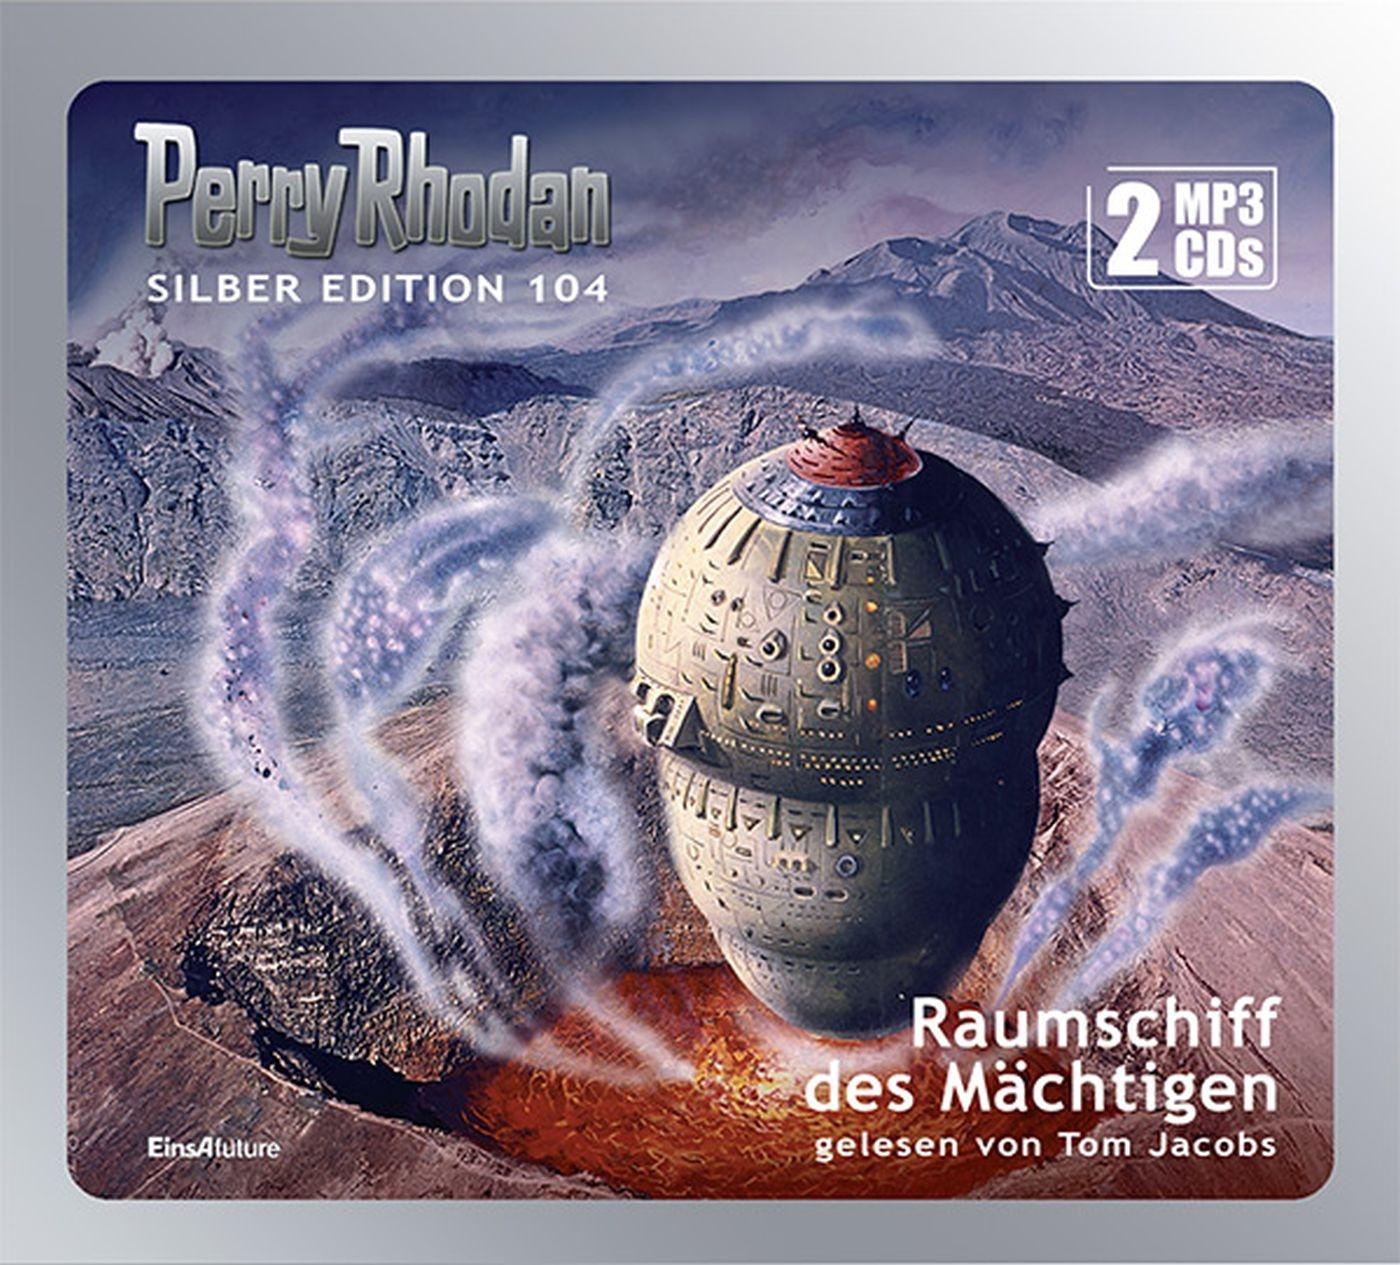 Perry Rhodan Silber Edition 104 Raumschiff des Mächtigen (2 mp3-CDs)